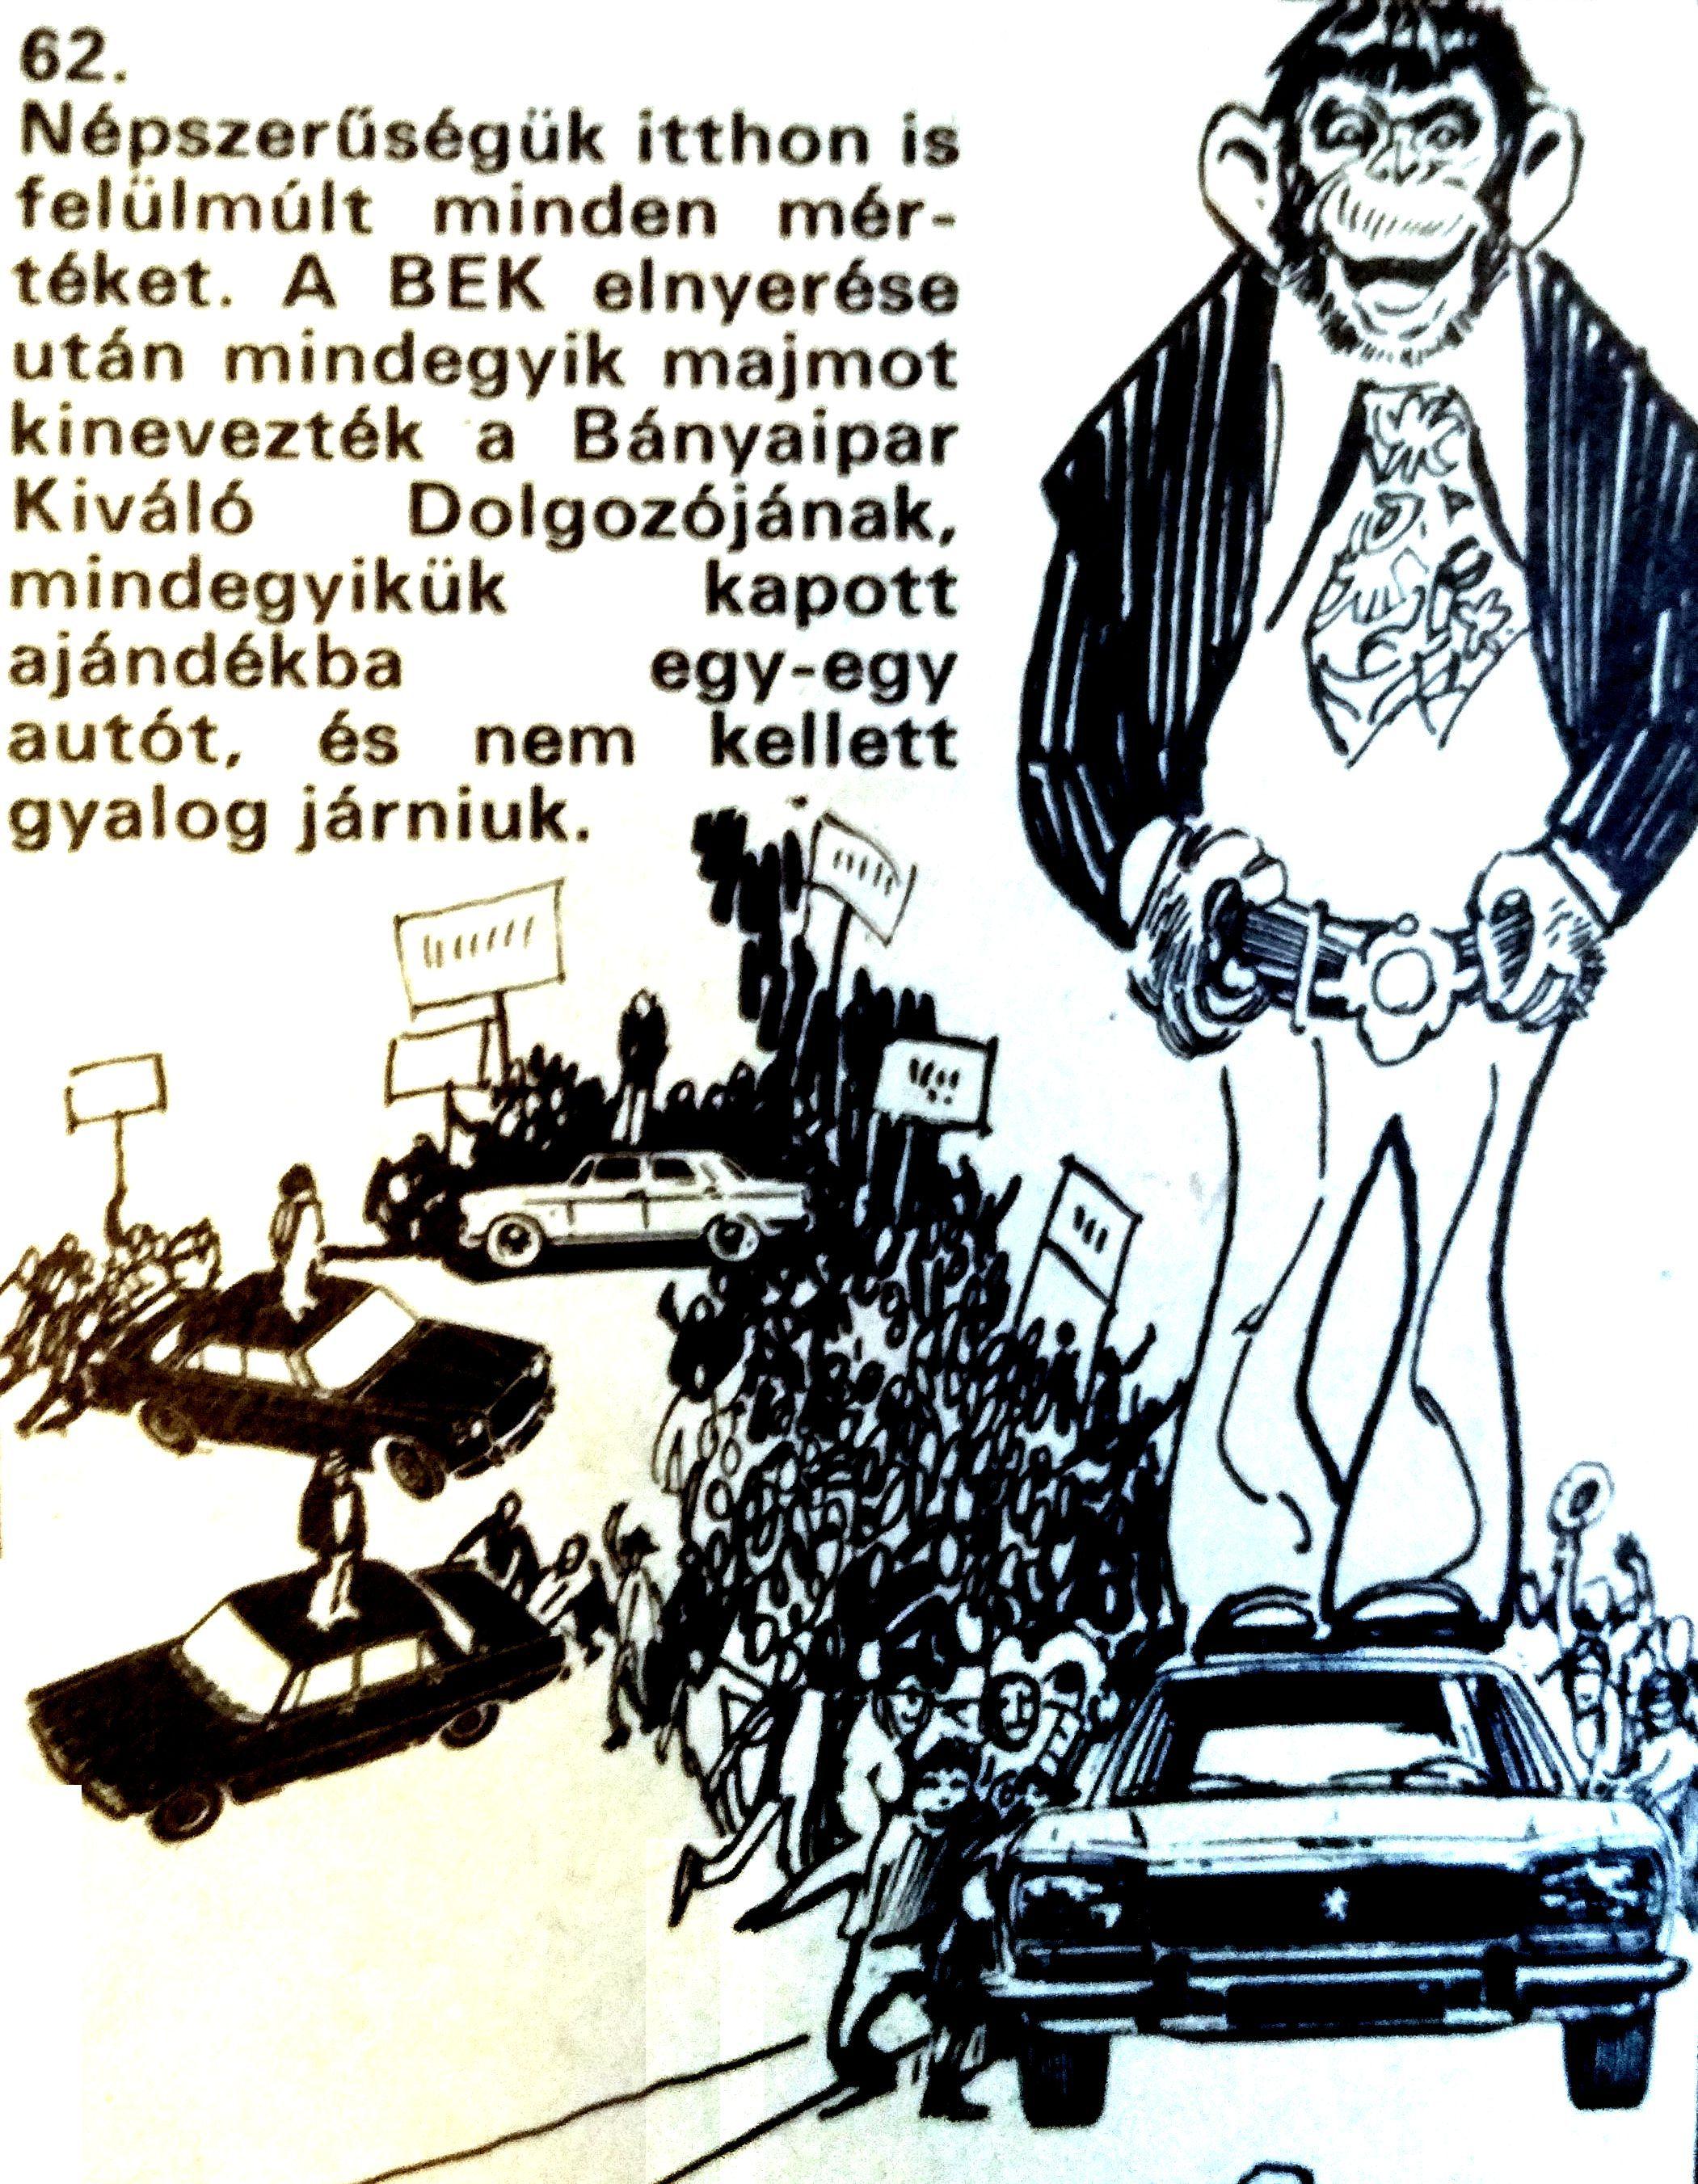 moldova_zorad_a_verhetetlen_11_kep333.jpg